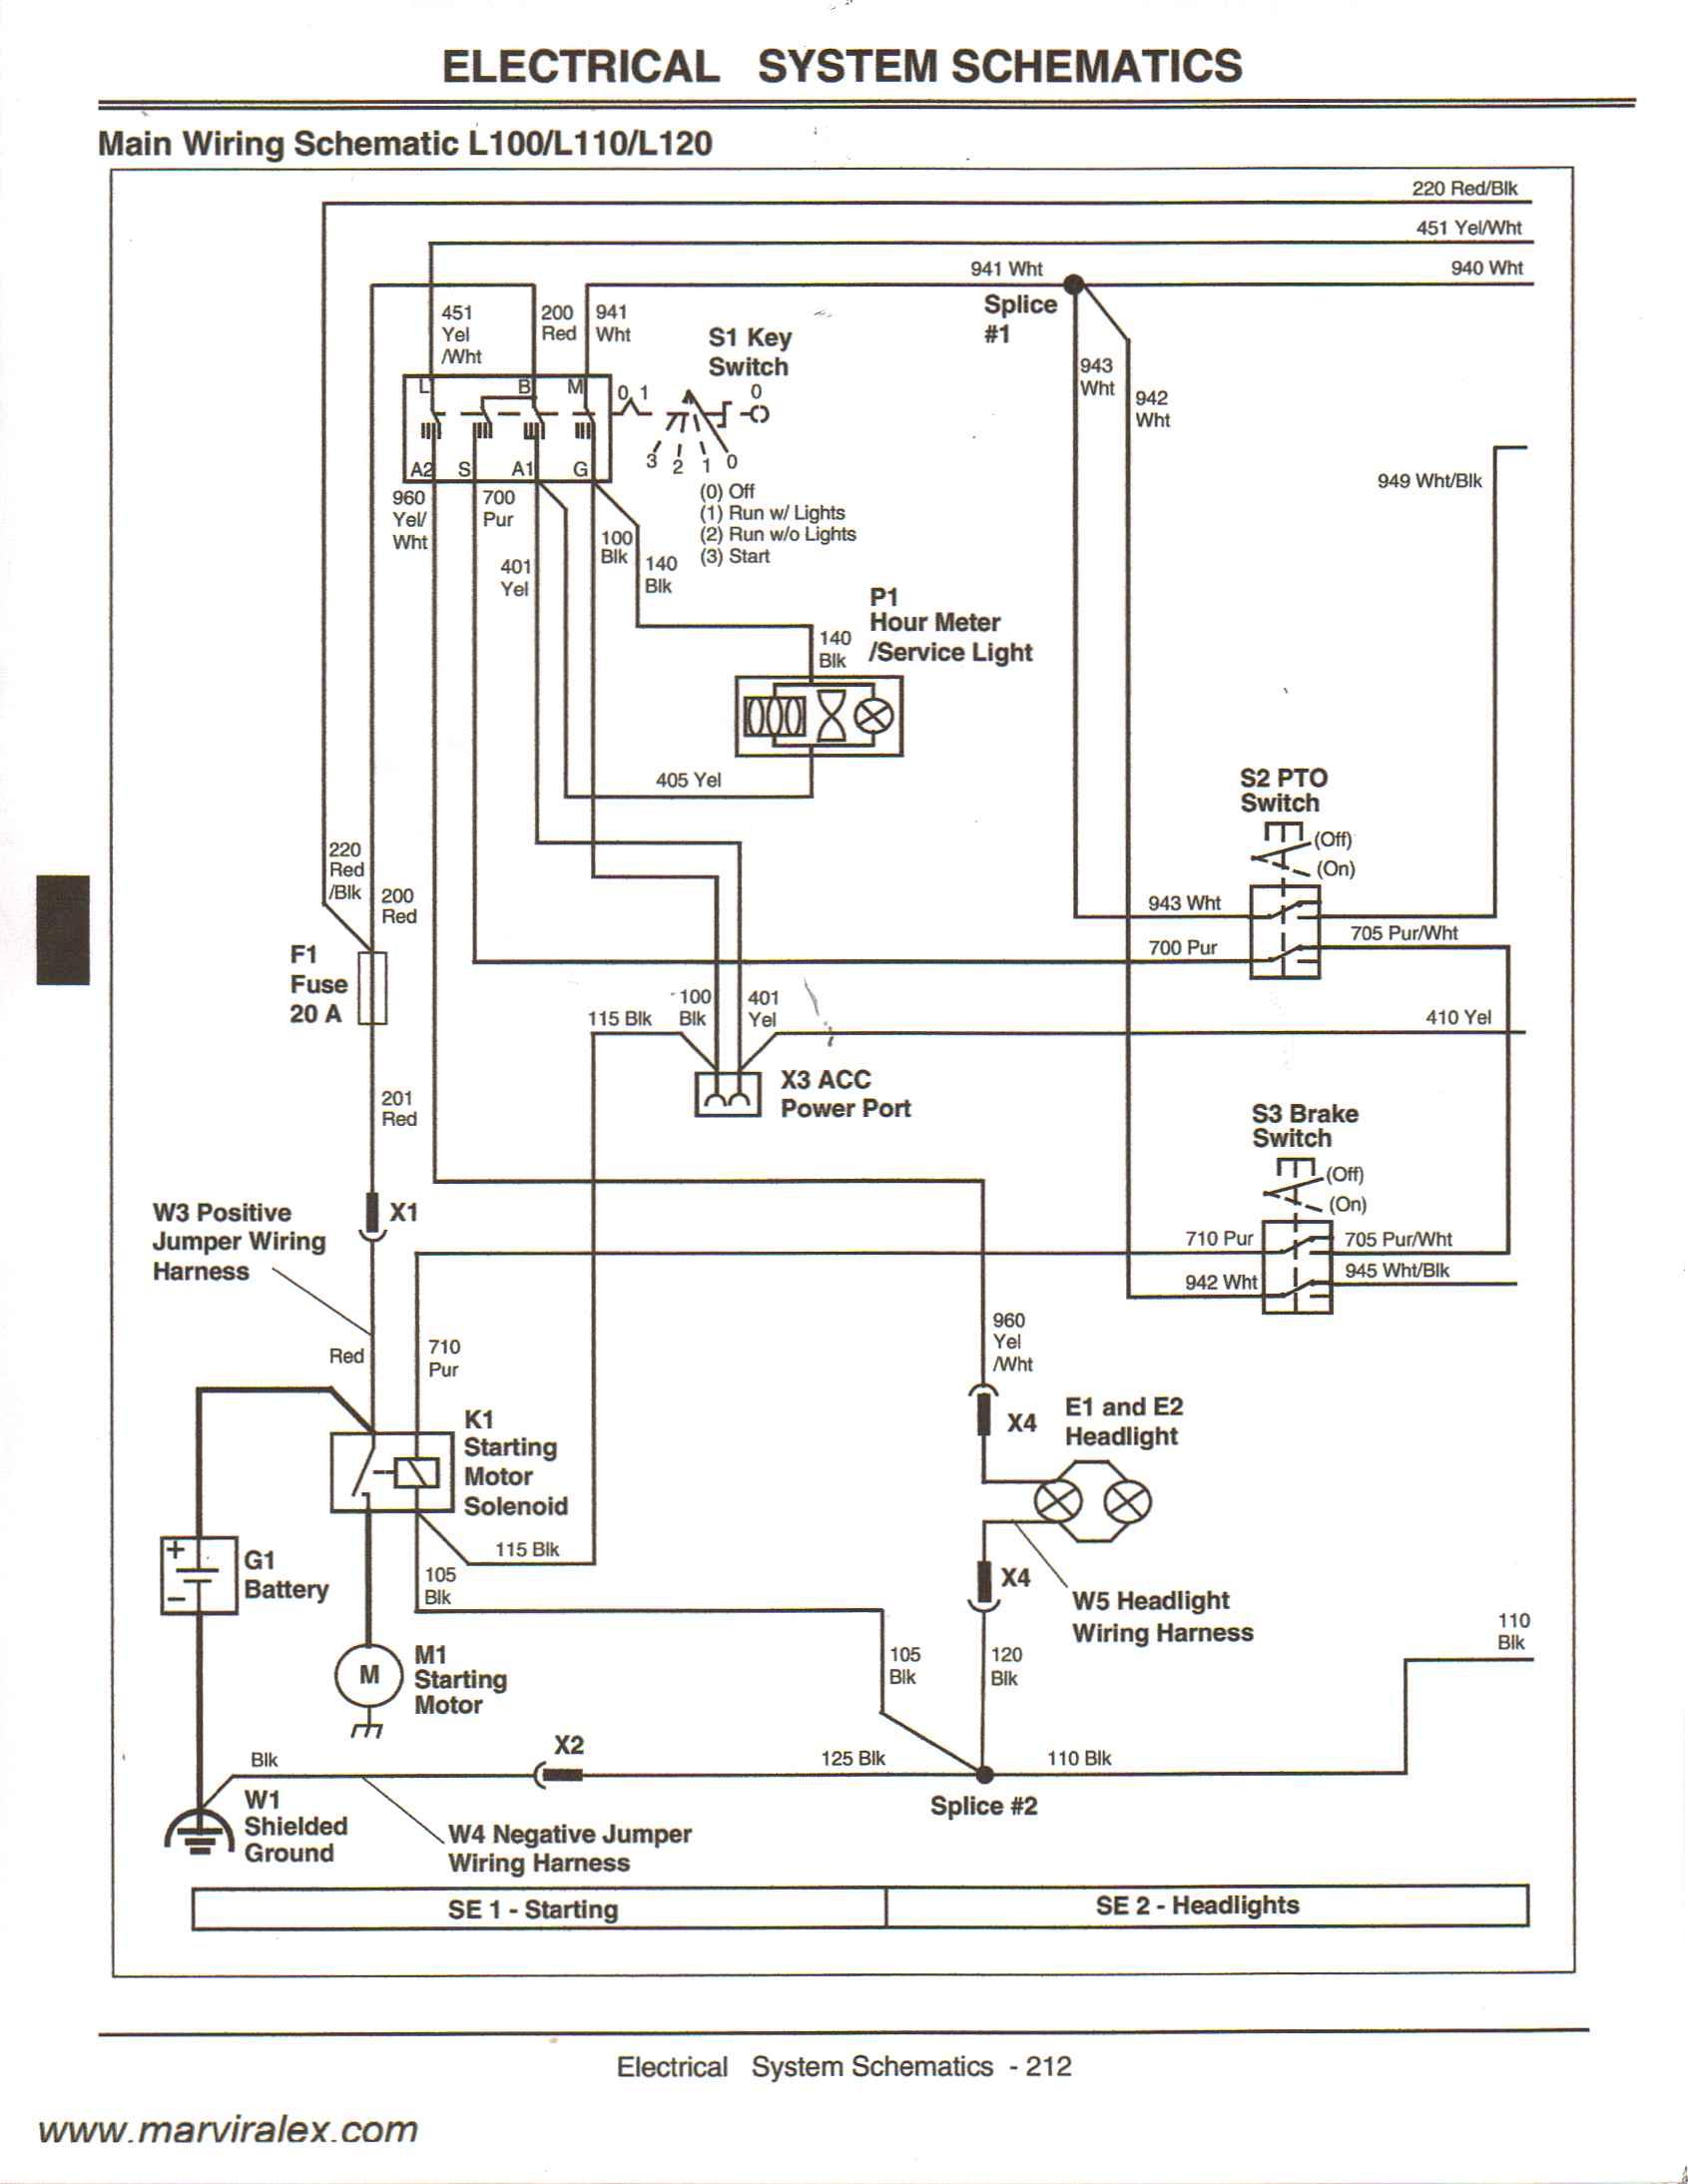 John Deere Lx255 Pto Wiring Diagram